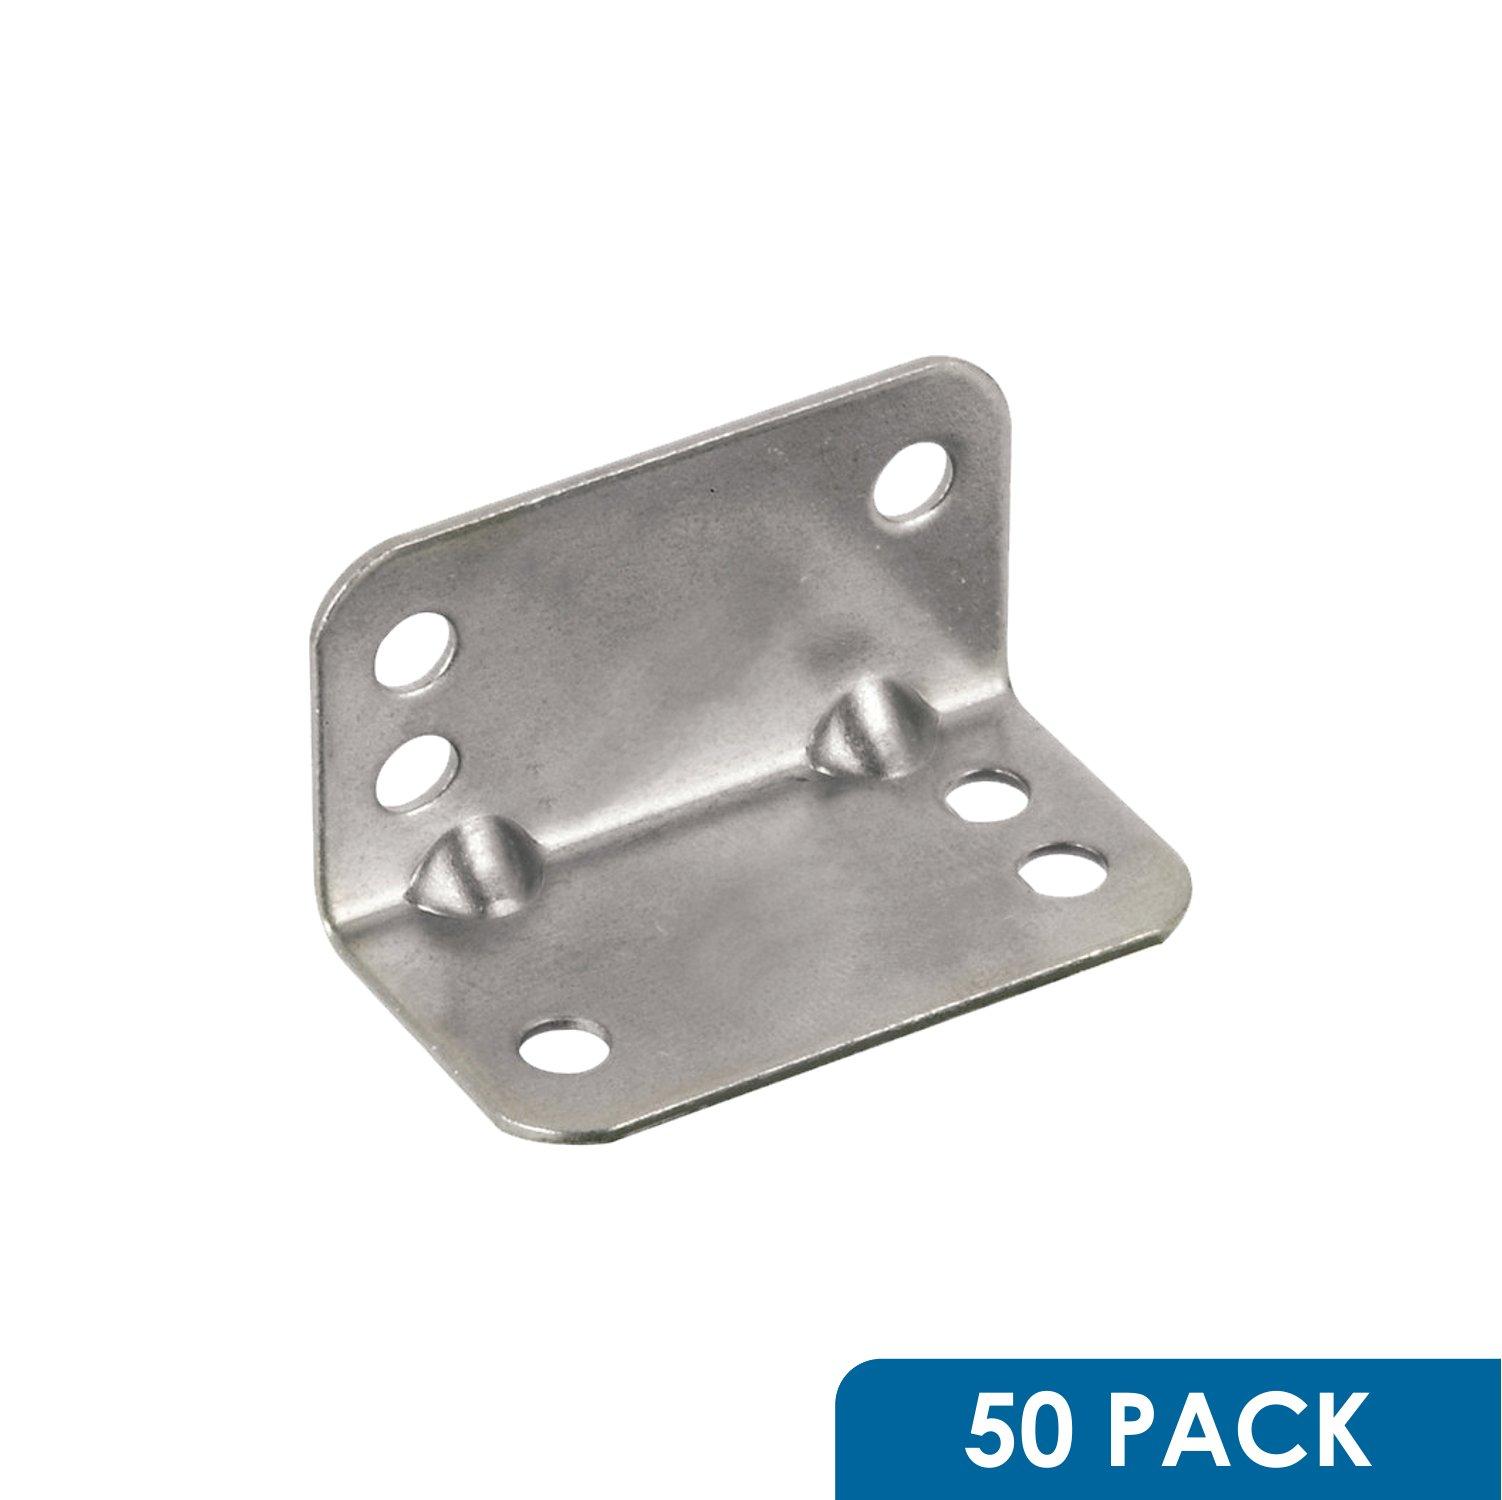 Rok Hardware Heavy Duty Metal Bracket Right Angle Brace, 20 Gauge, Zinc Finish, 50 Pack